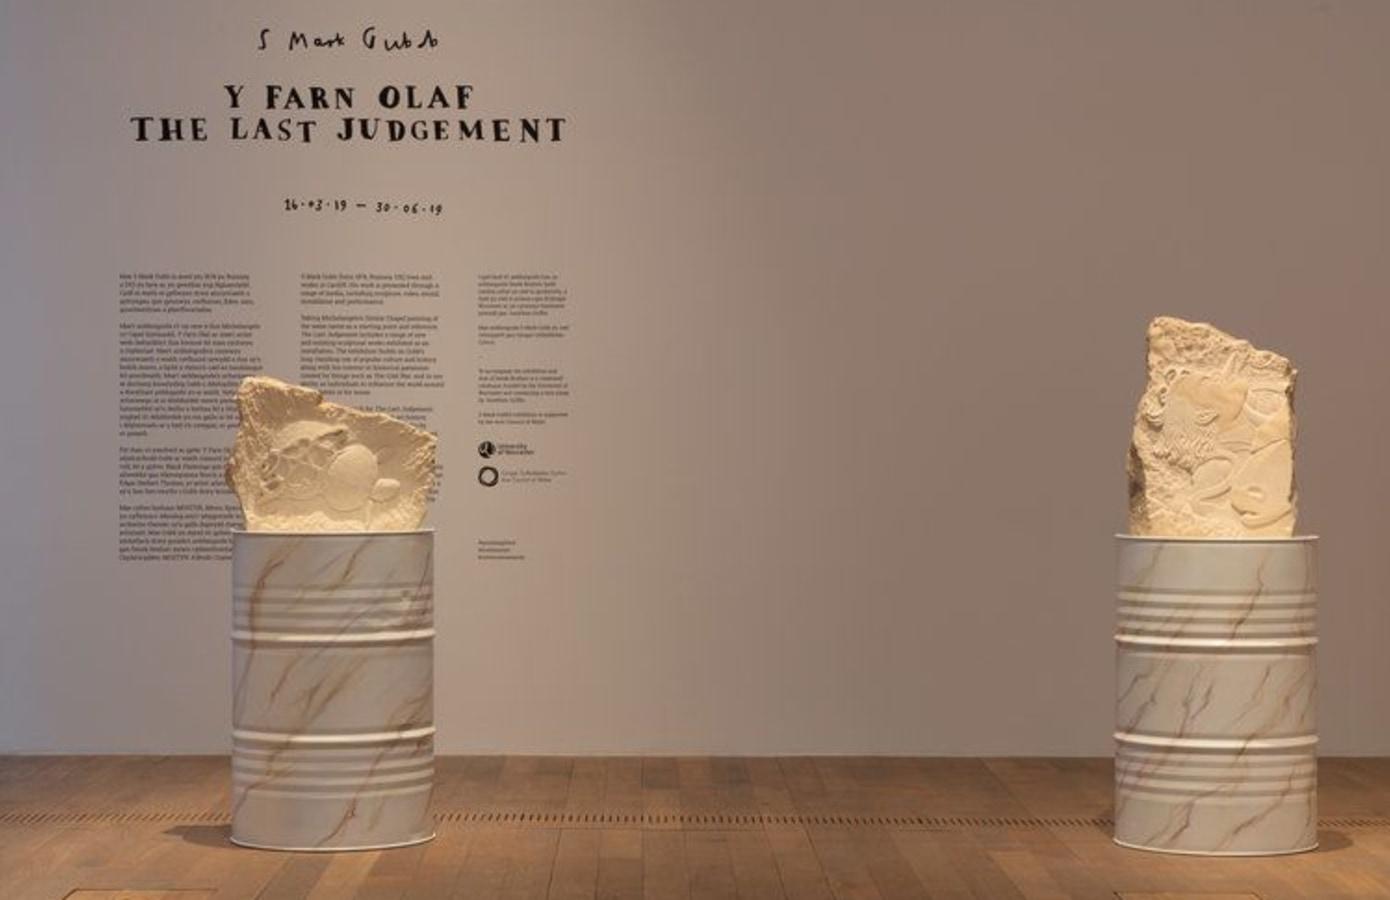 Art Rotterdam 2020, Edward Clydesdale Thomson, Mark Gubb,